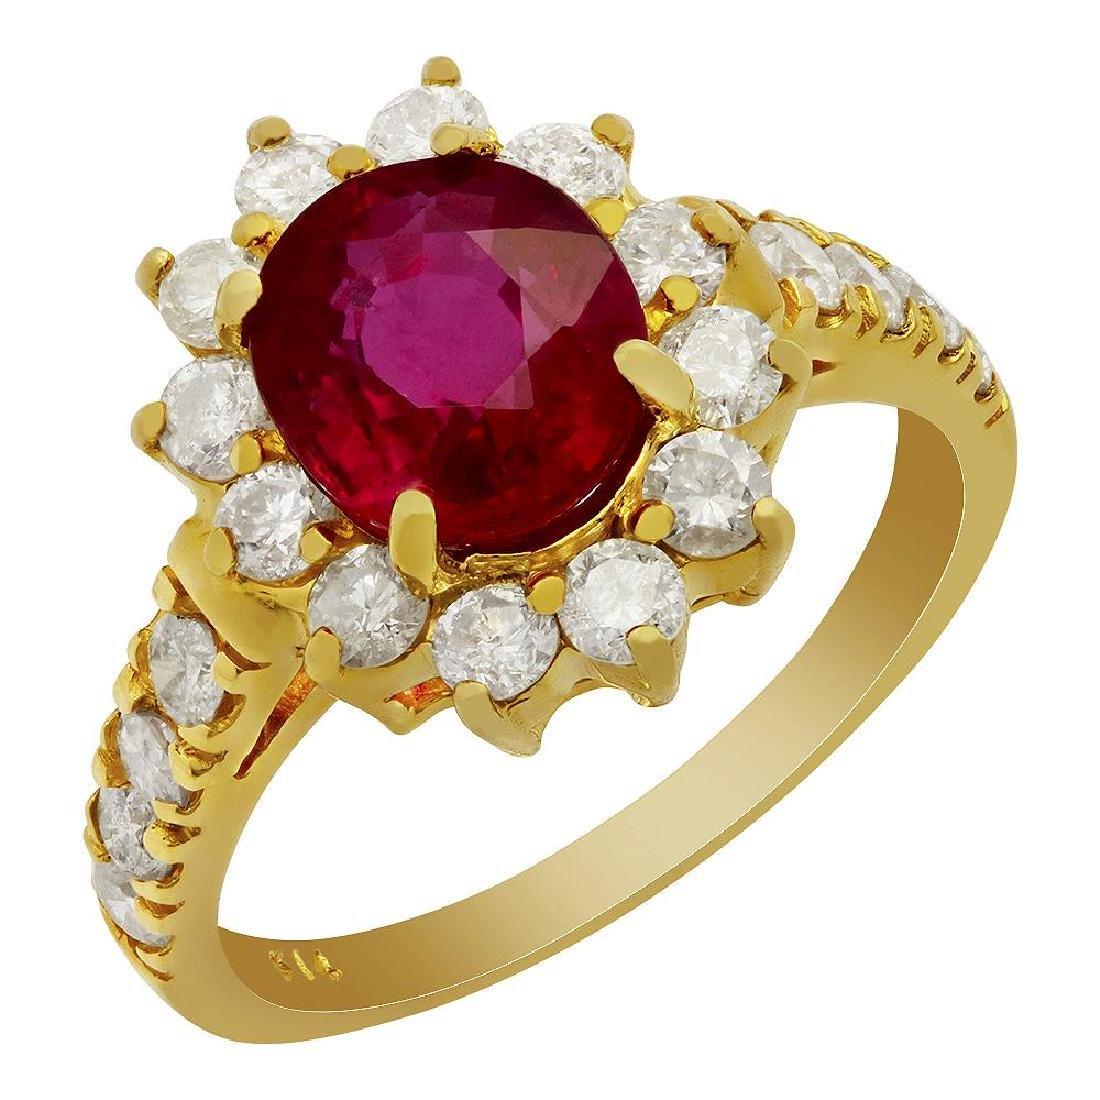 14k Yellow Gold 2.41ct Ruby 1.13ct Diamond Ring